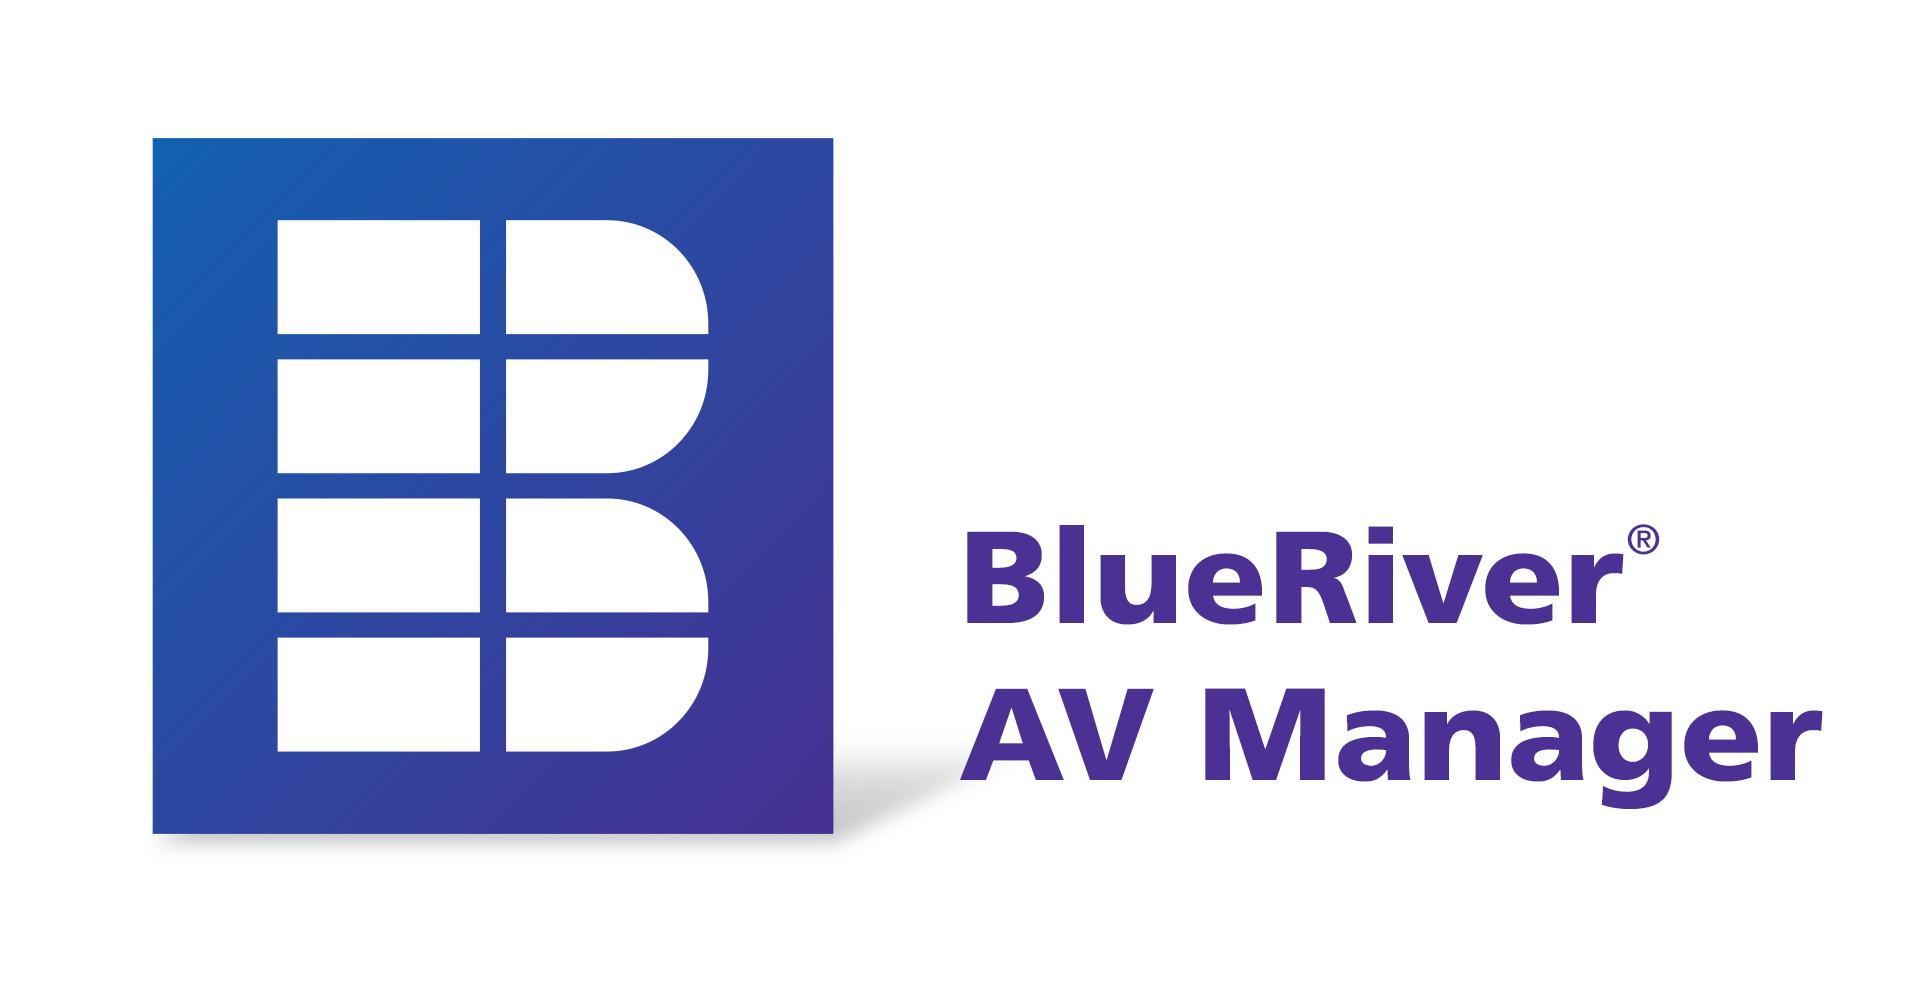 TechnologyPage_BlueRiver_AV_Manager_Landing_1920x1003-no-dwload